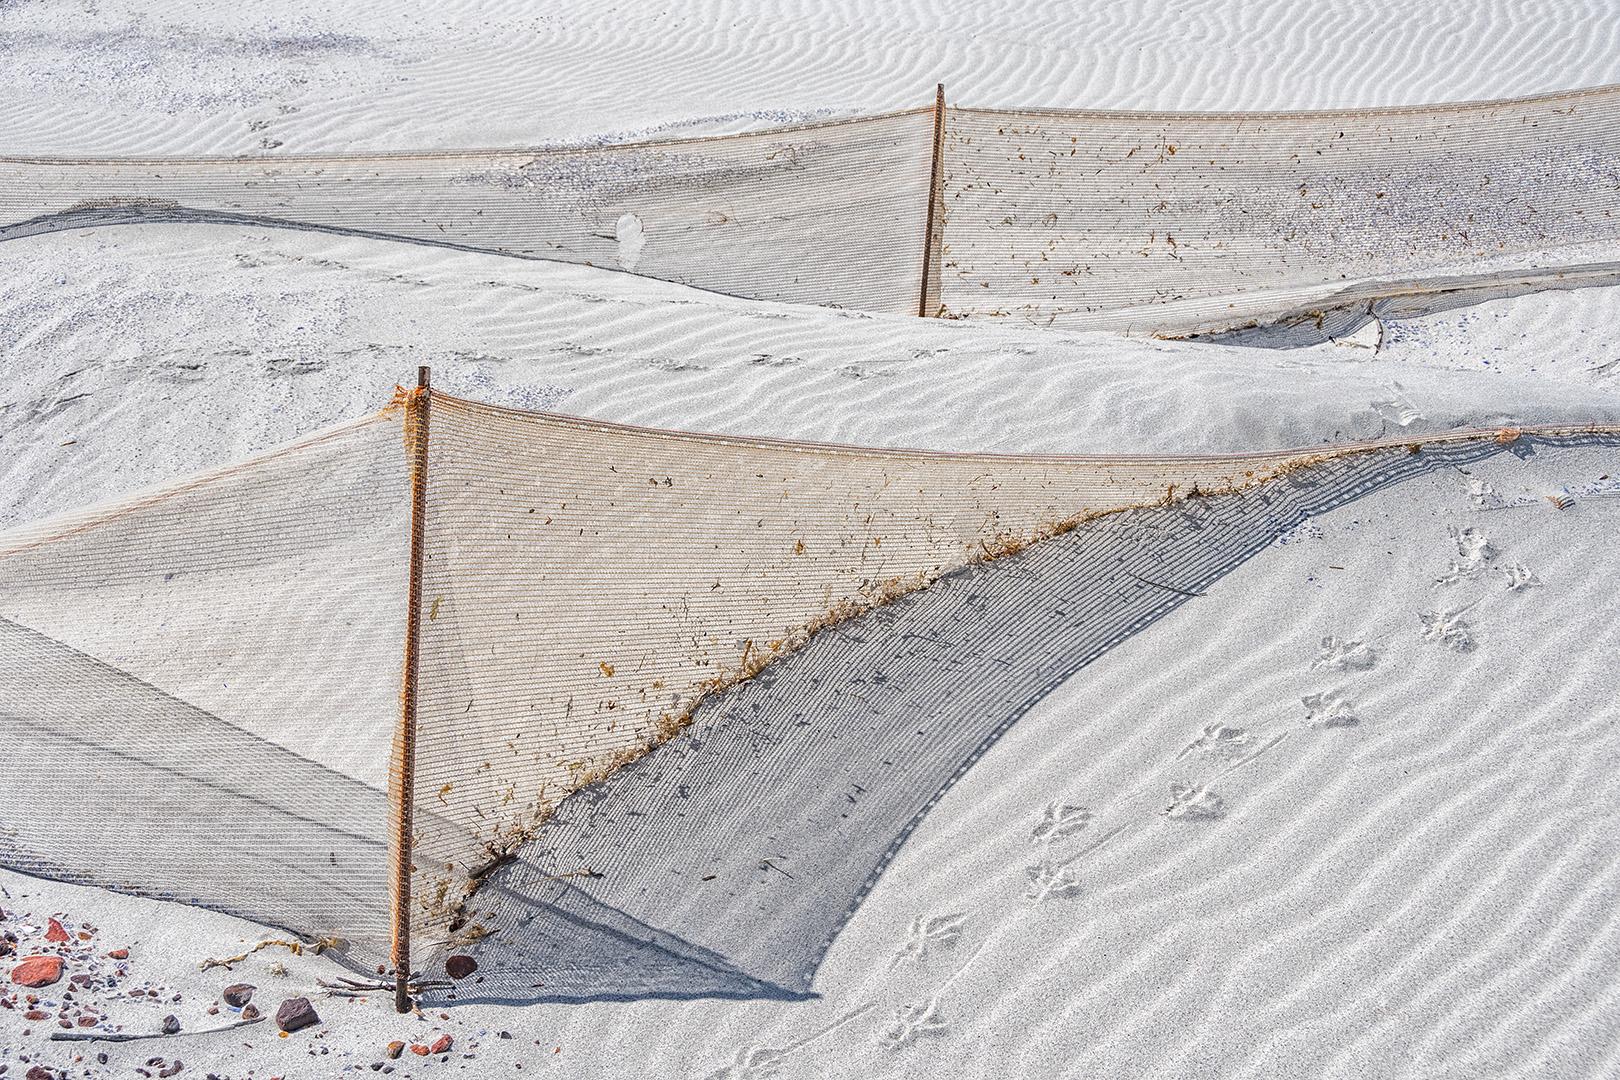 10 Slanghoek Dunes